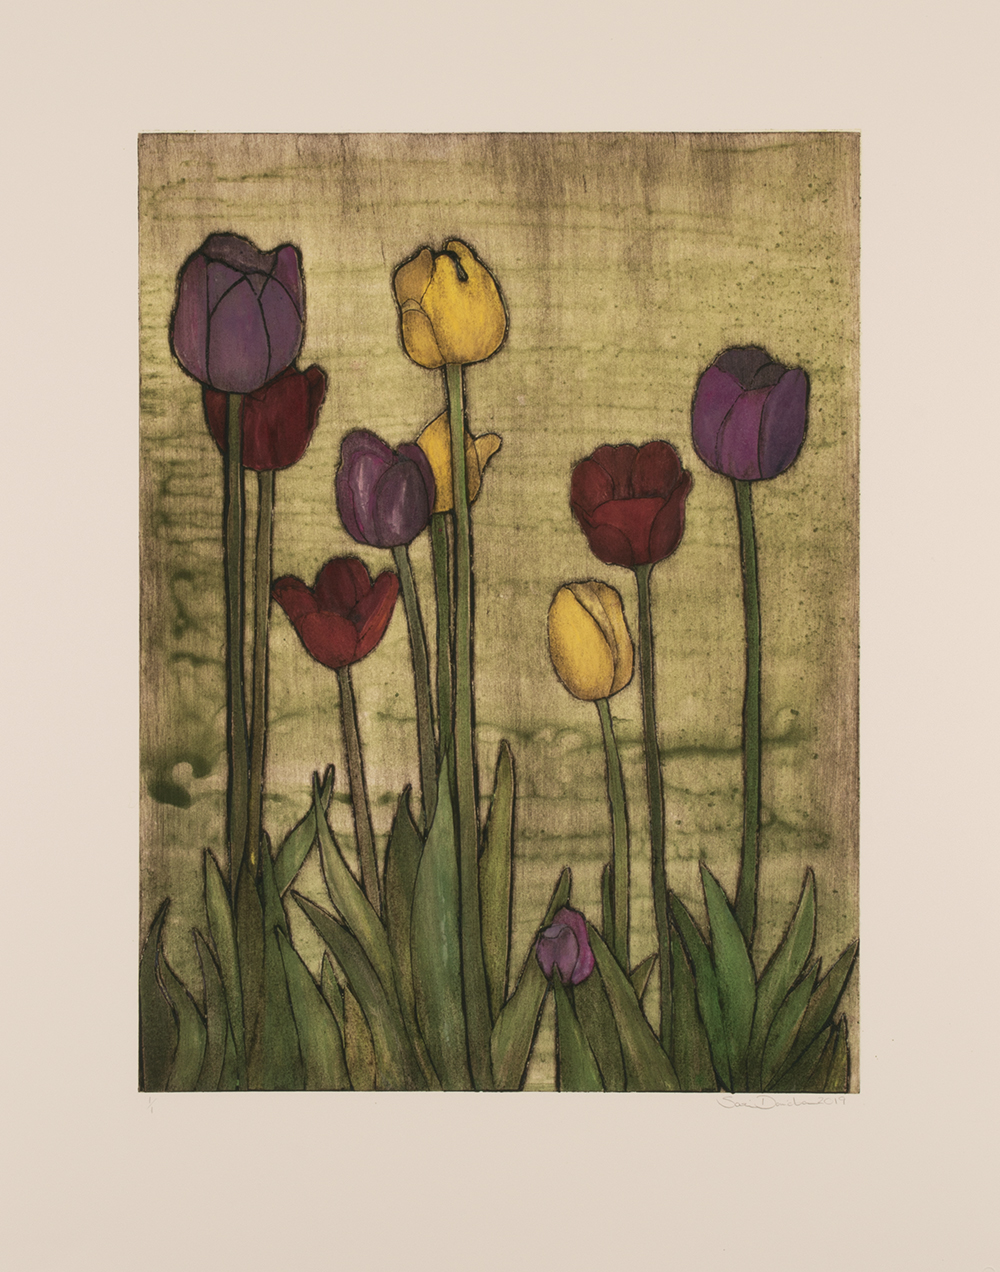 Little Shop of Tulips by Sari Davidson